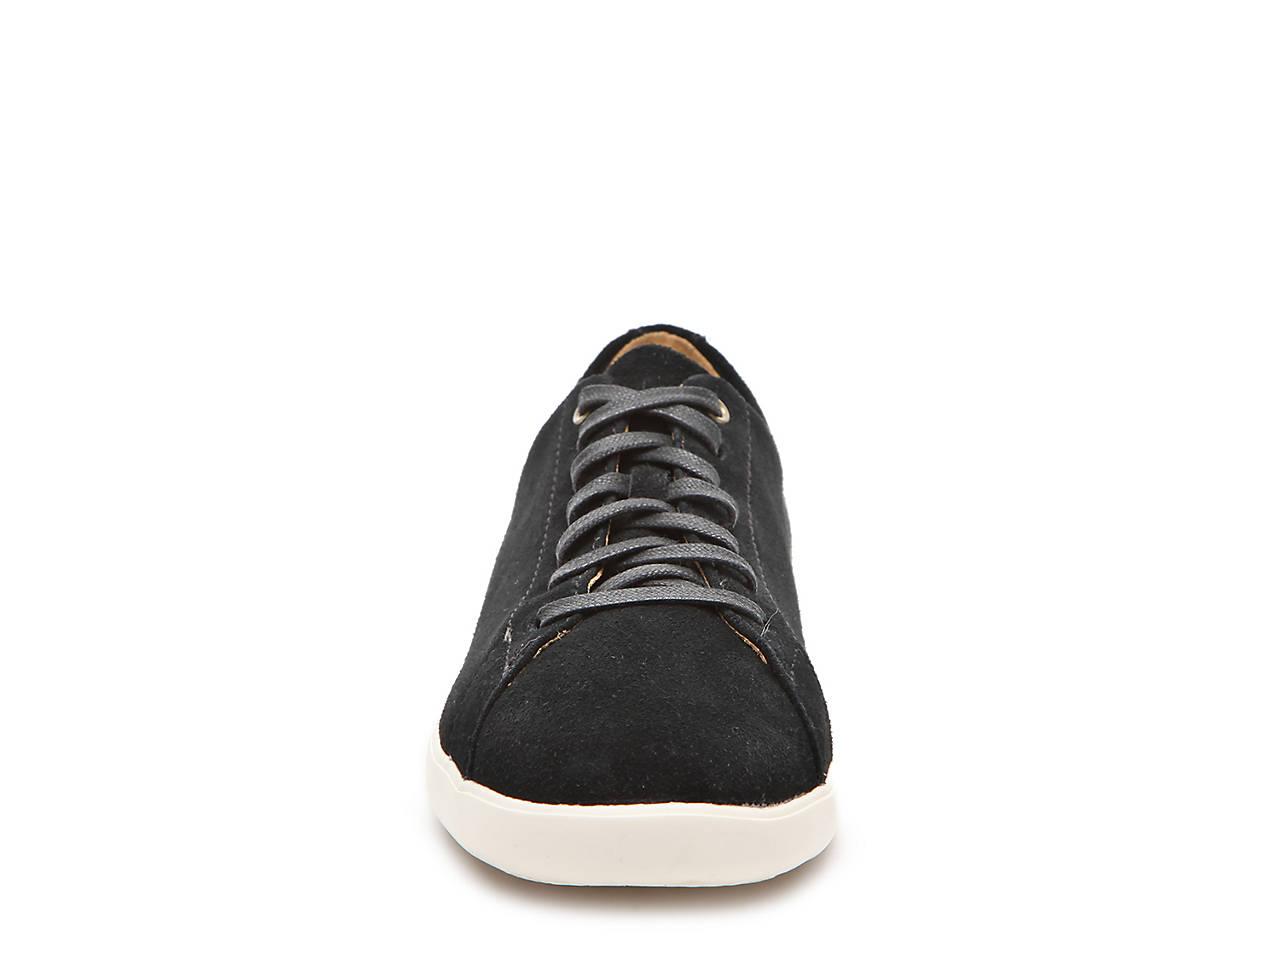 27c436d94fa6 Cole Haan Grand Crosscourt II Sneaker - Women s Women s Shoes